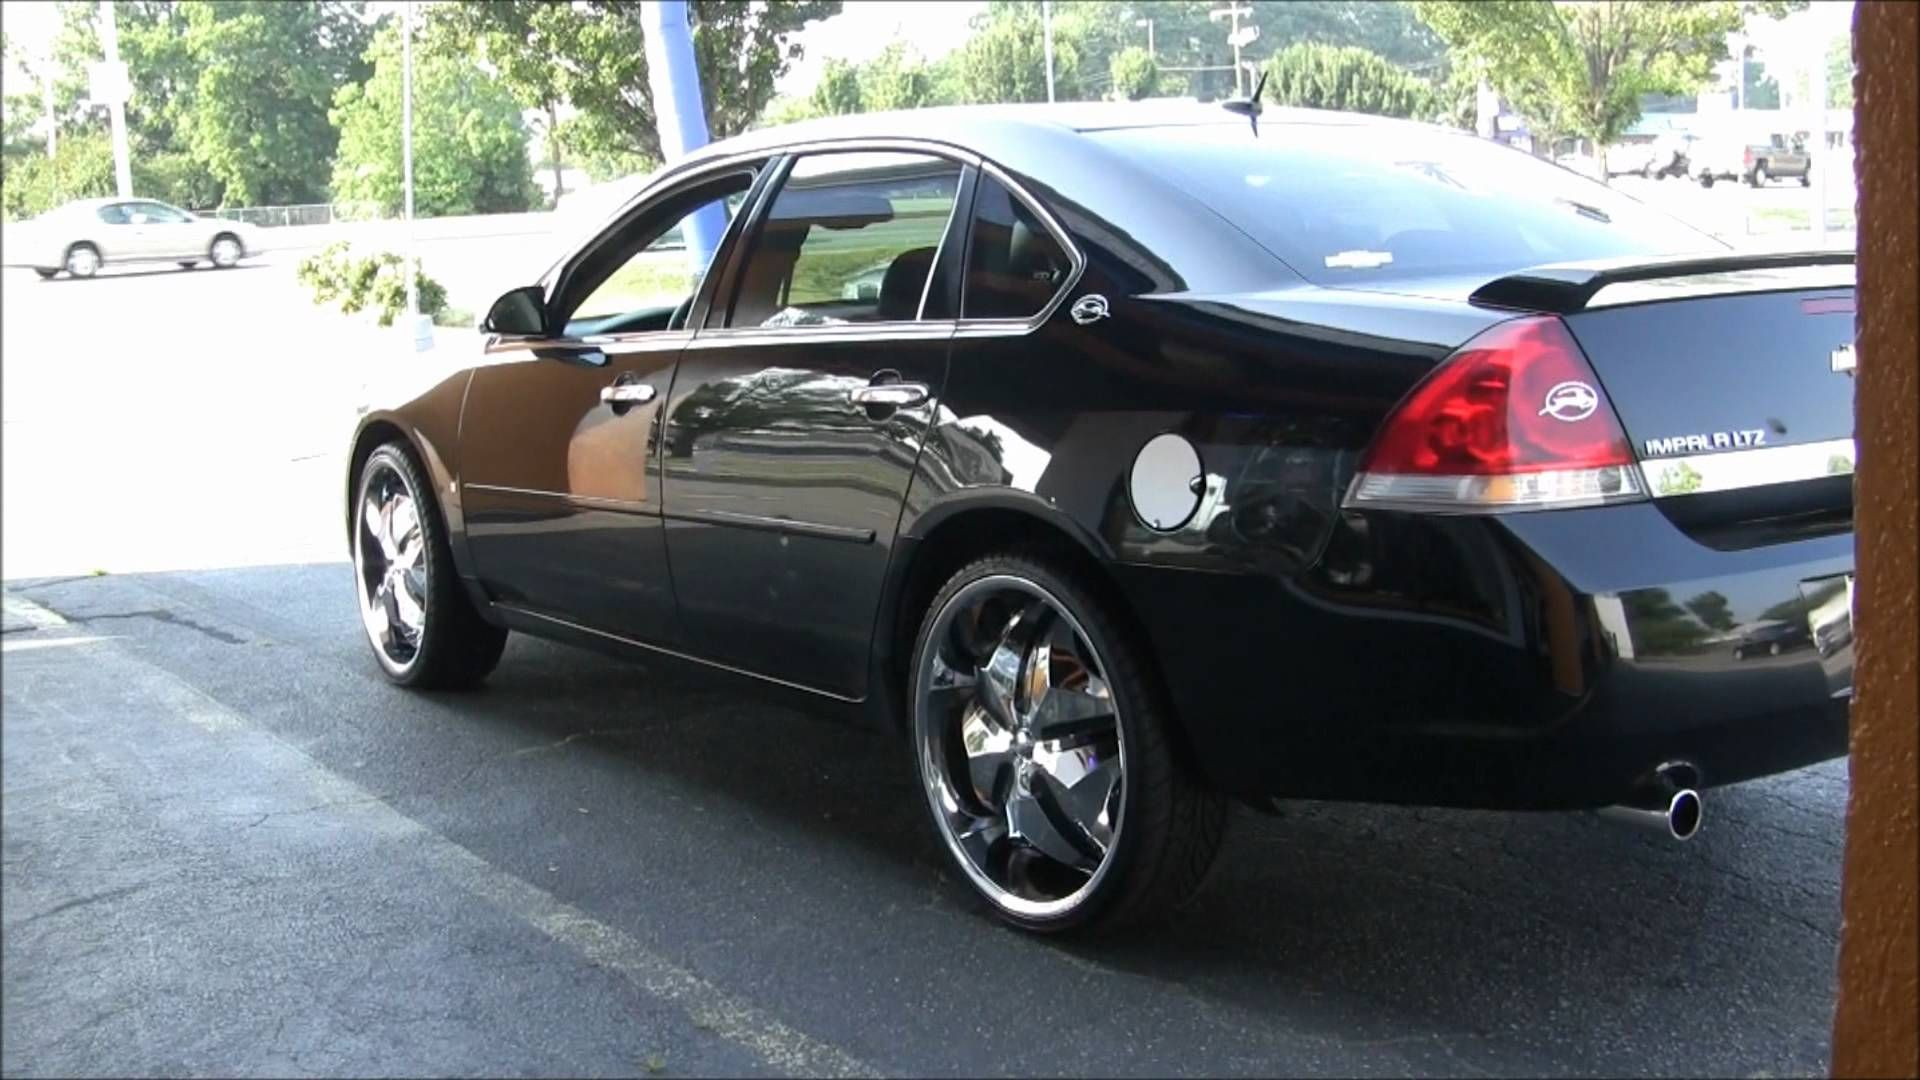 Black Rims For Chevy Impala Maxresdefault Jpg Impala Chevy